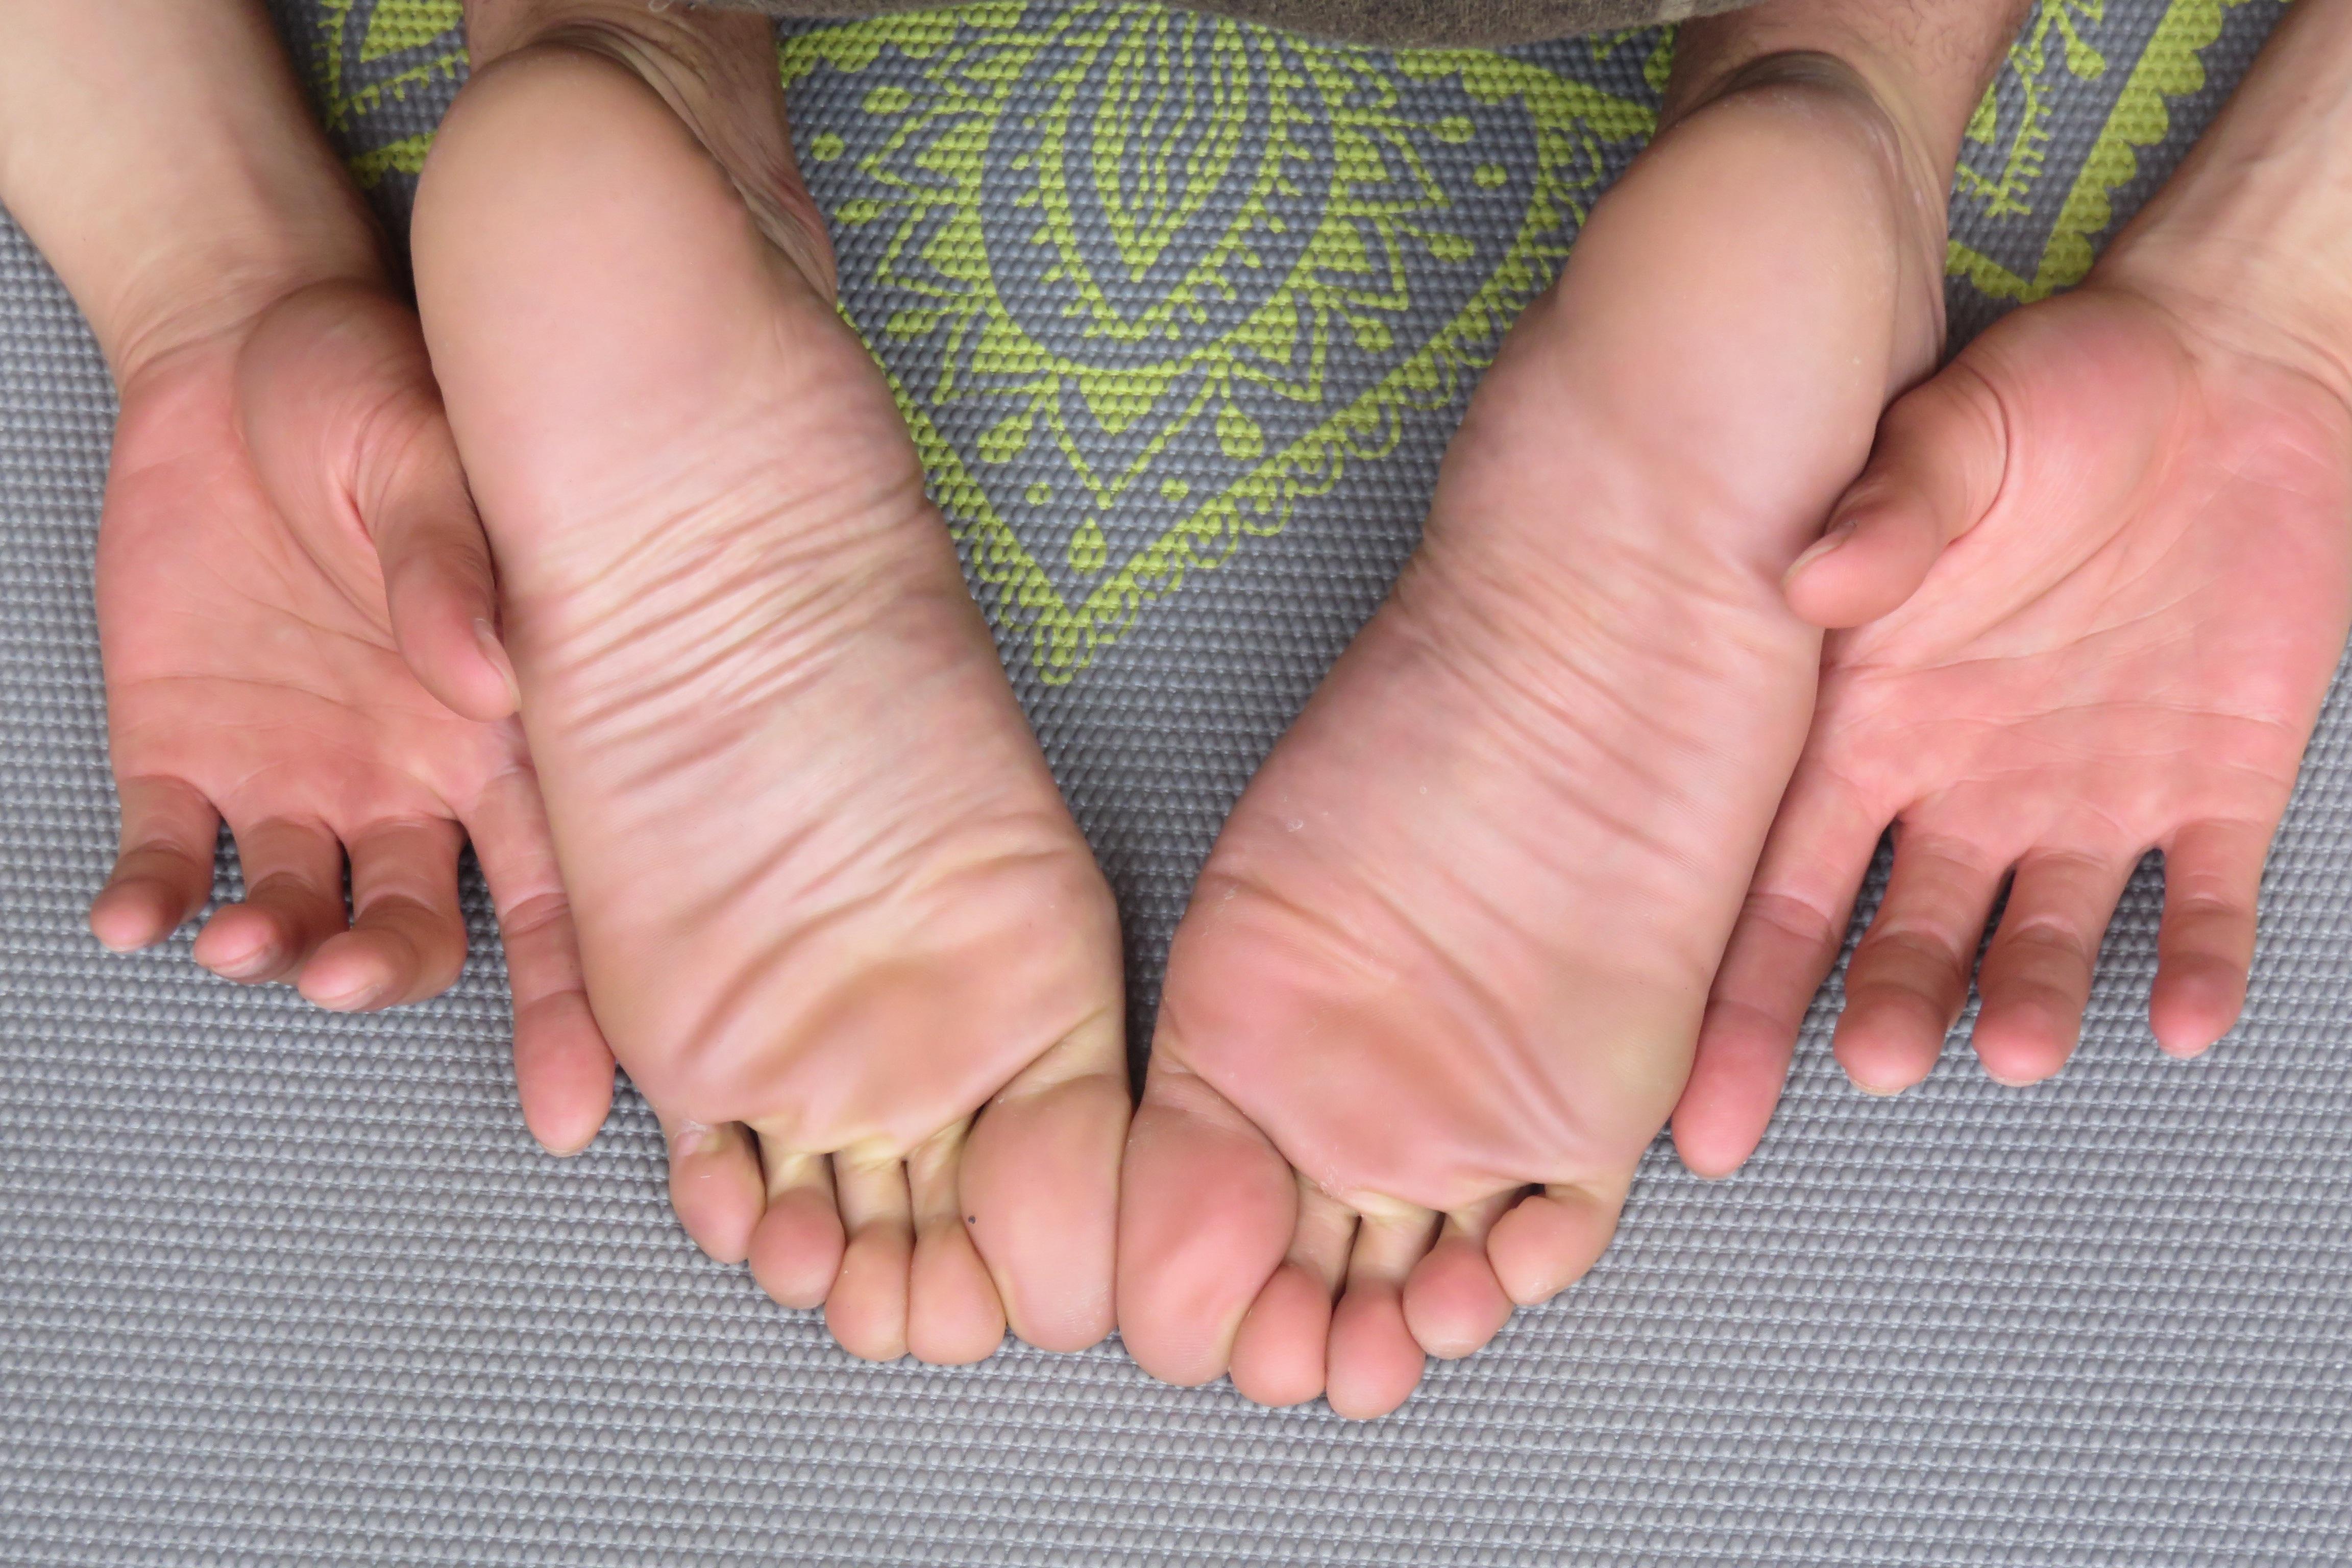 стопа и пальцы ног картинки наши идеи